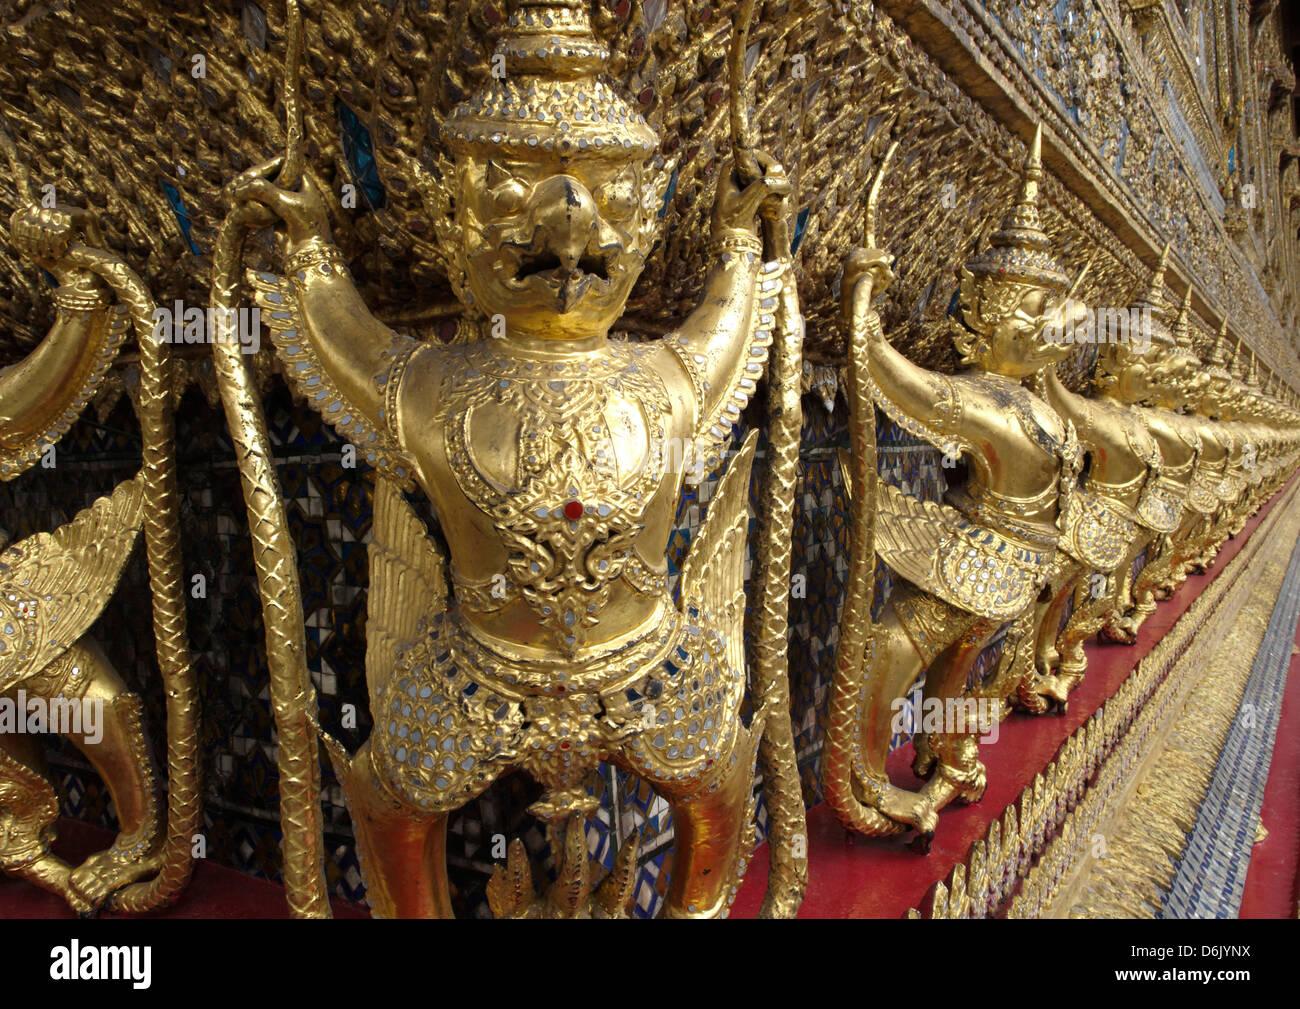 Garudas and nagas on external decorations of the Ubosoth, Wat Phra Kaew temple, Grand Palace, Bangkok, Thailand - Stock Image